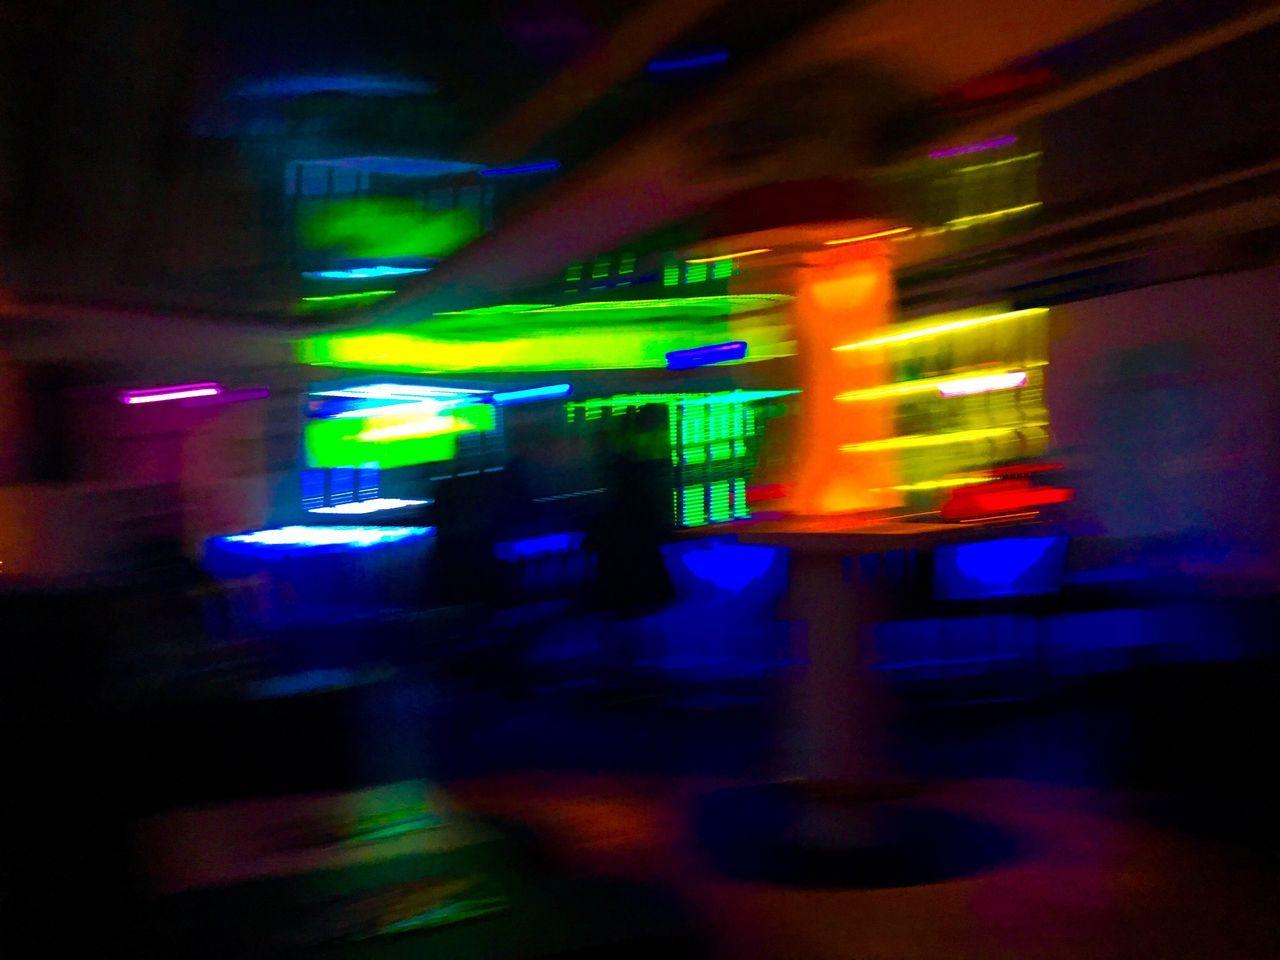 illuminated, night, blurred motion, transportation, speed, no people, land vehicle, outdoors, neon, city, close-up